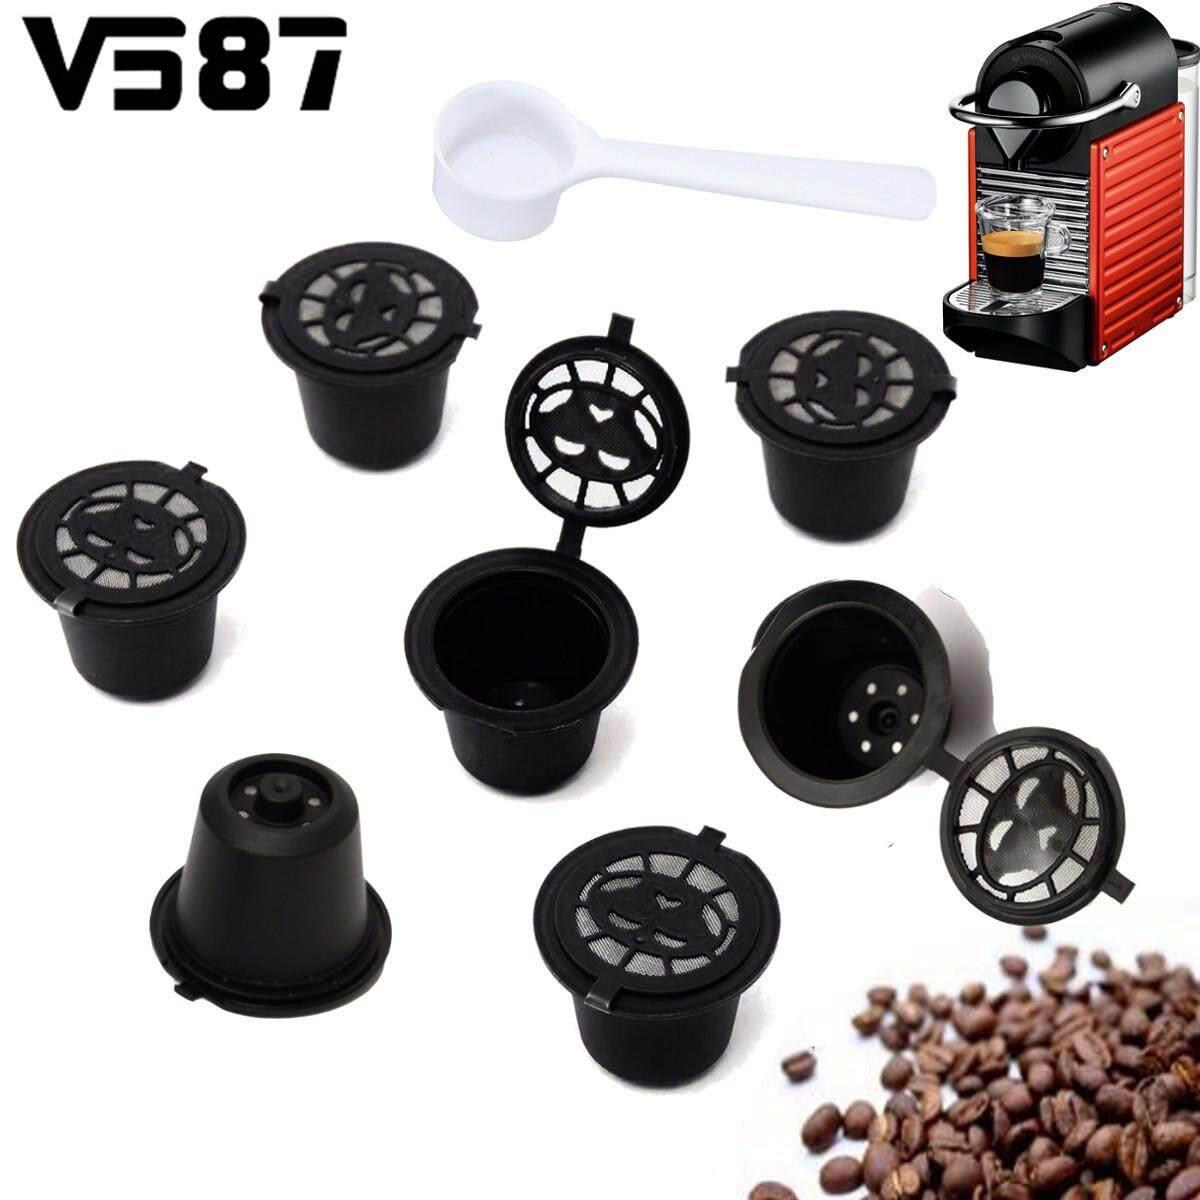 7 Pcs Isi Ulang Mikro Jaring Penyaring Kopi Kapsul Pod Espresso Brewer Filter Dapur Kedai Kopi